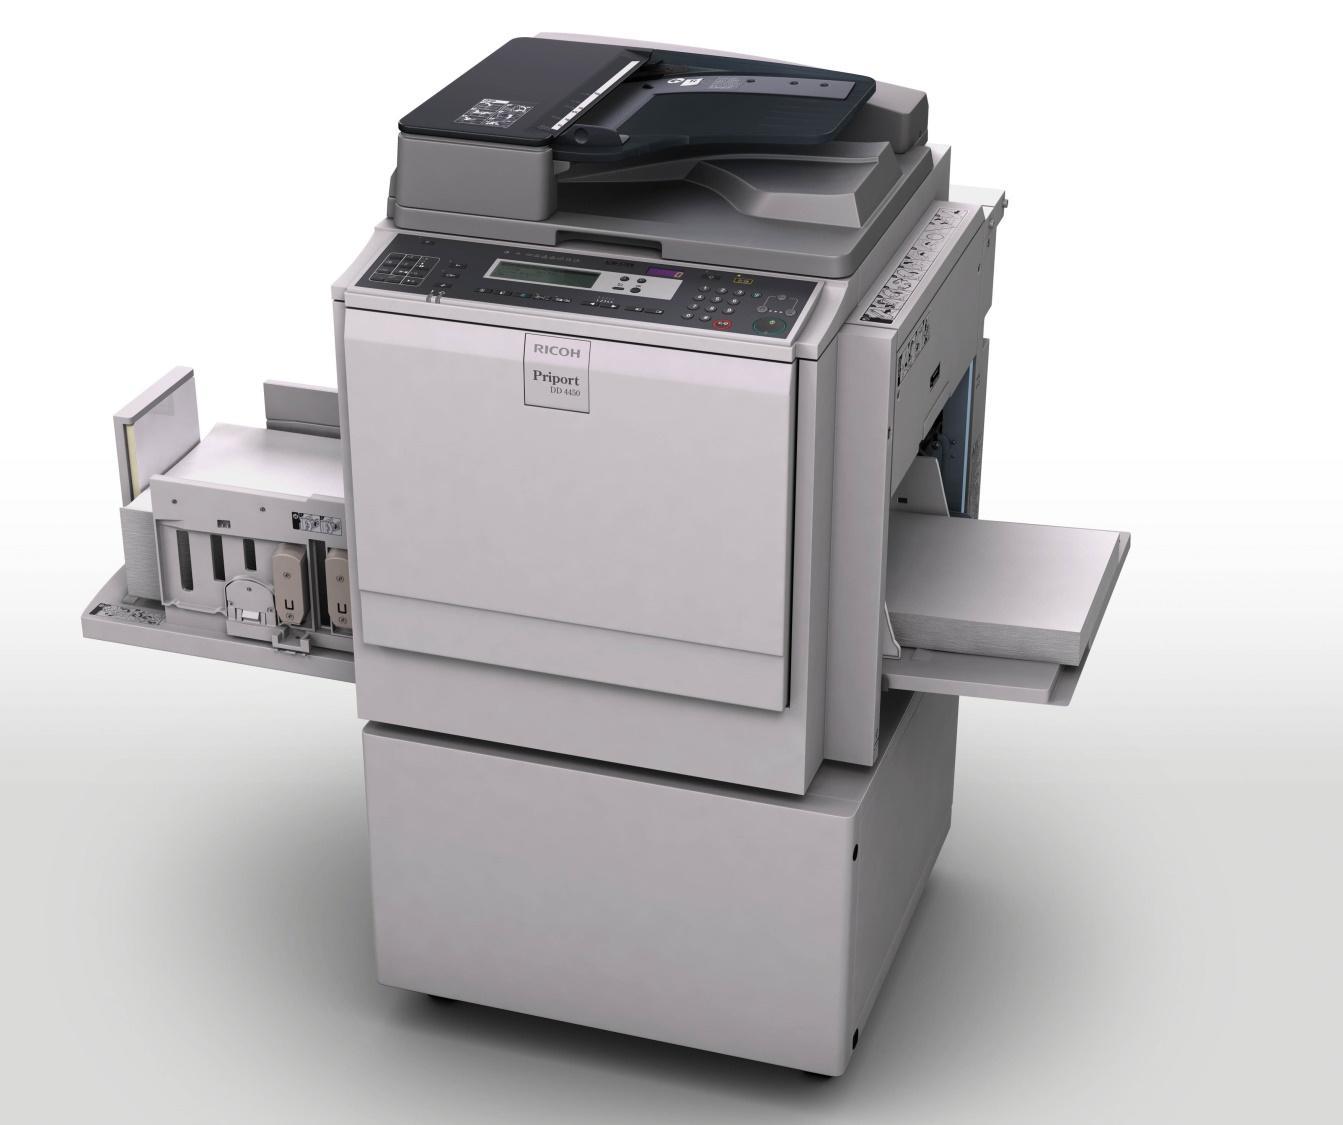 aOLsOco83 VixInIp4uDpYnD ANHfsWz8rF1TcgN3Oz8QBQZbQjBKEFRzRhz0uWlKi8pvD1eZzSUttXfTsoMldJ4TObSQYi1KEvsX5bqfU4QfCdFKBGgrlaoRaFbusn9HatW5XDaAQkpdt5Uyg - Tìm hiểu để biết mua máy in siêu tốc loại nào tốt nhất hiện nay?